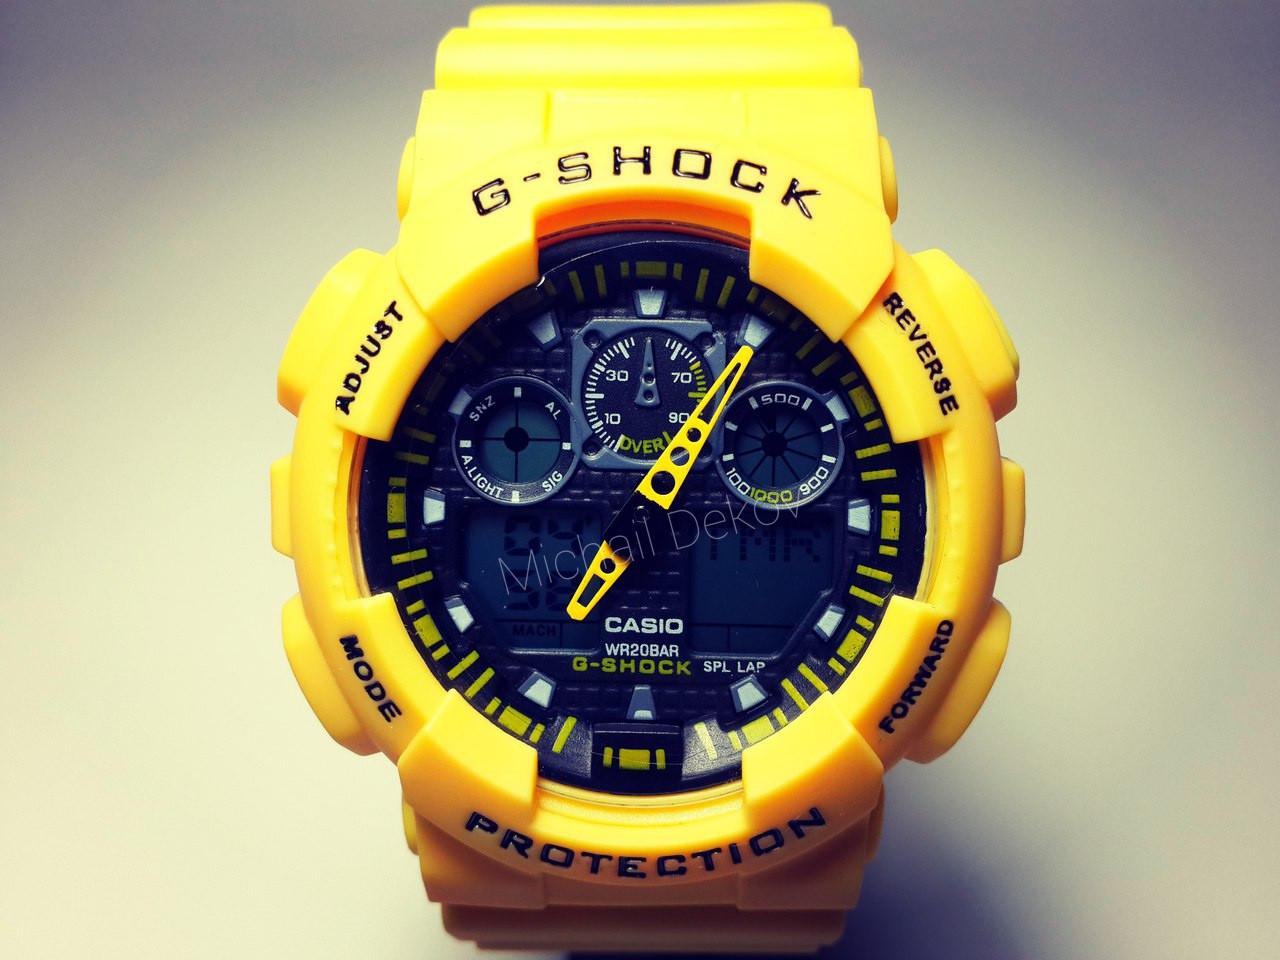 ЧАСЫ CASIO G-SHOCK GA-100   yellow -реплика